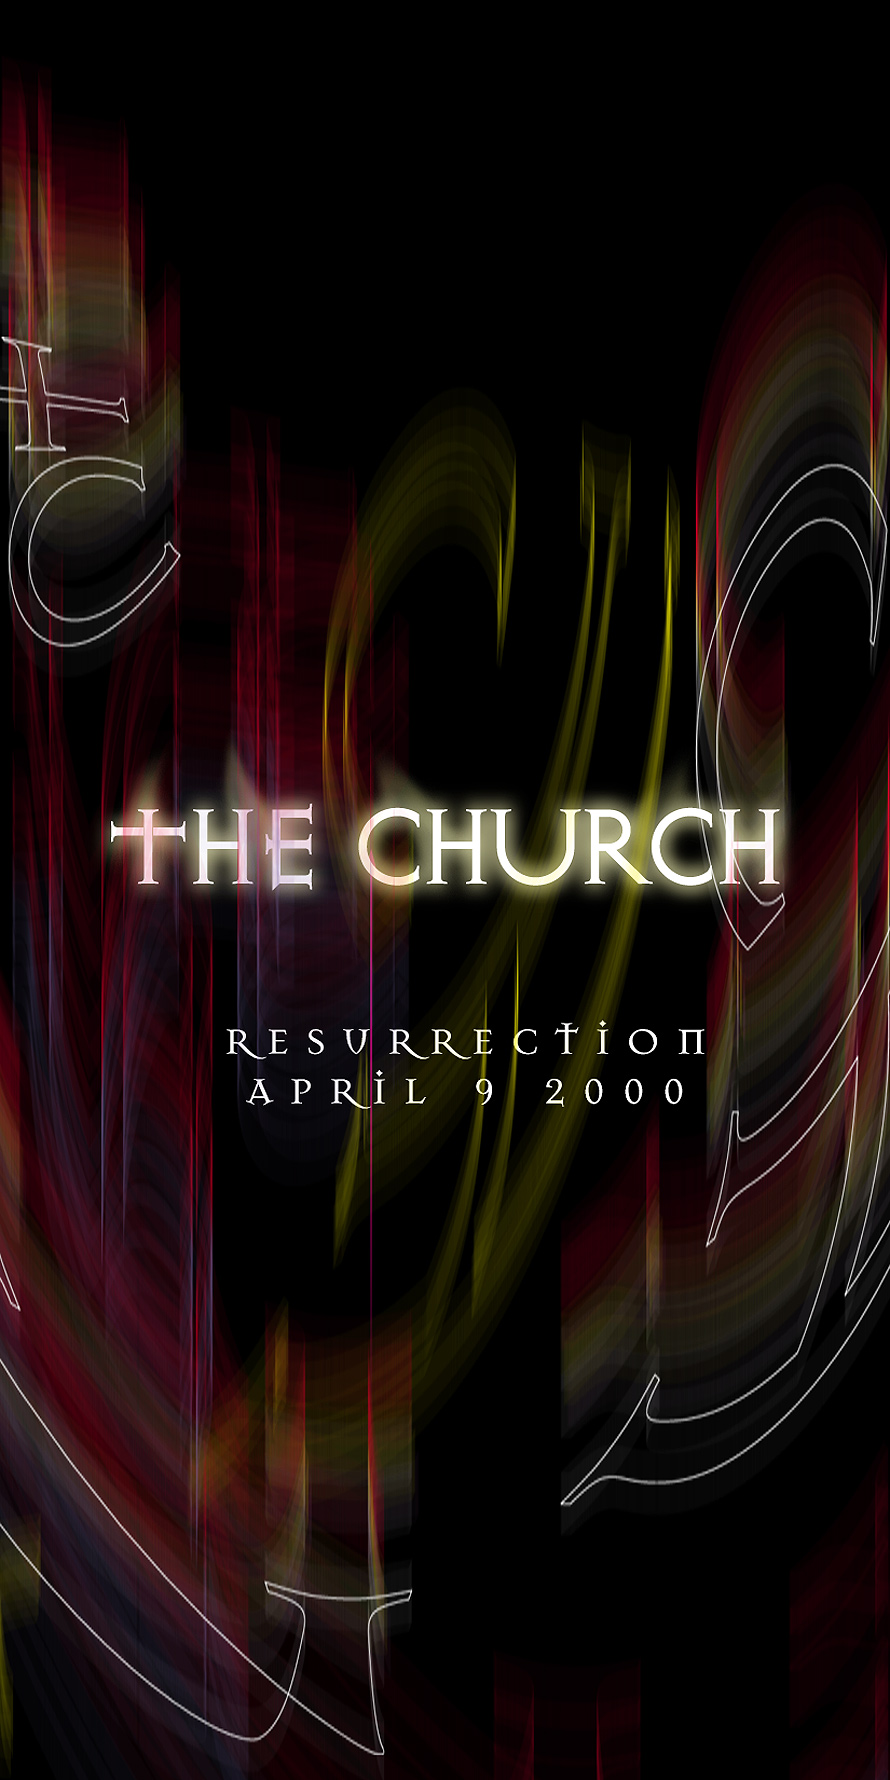 Resurrection at The Church in Miami Beach